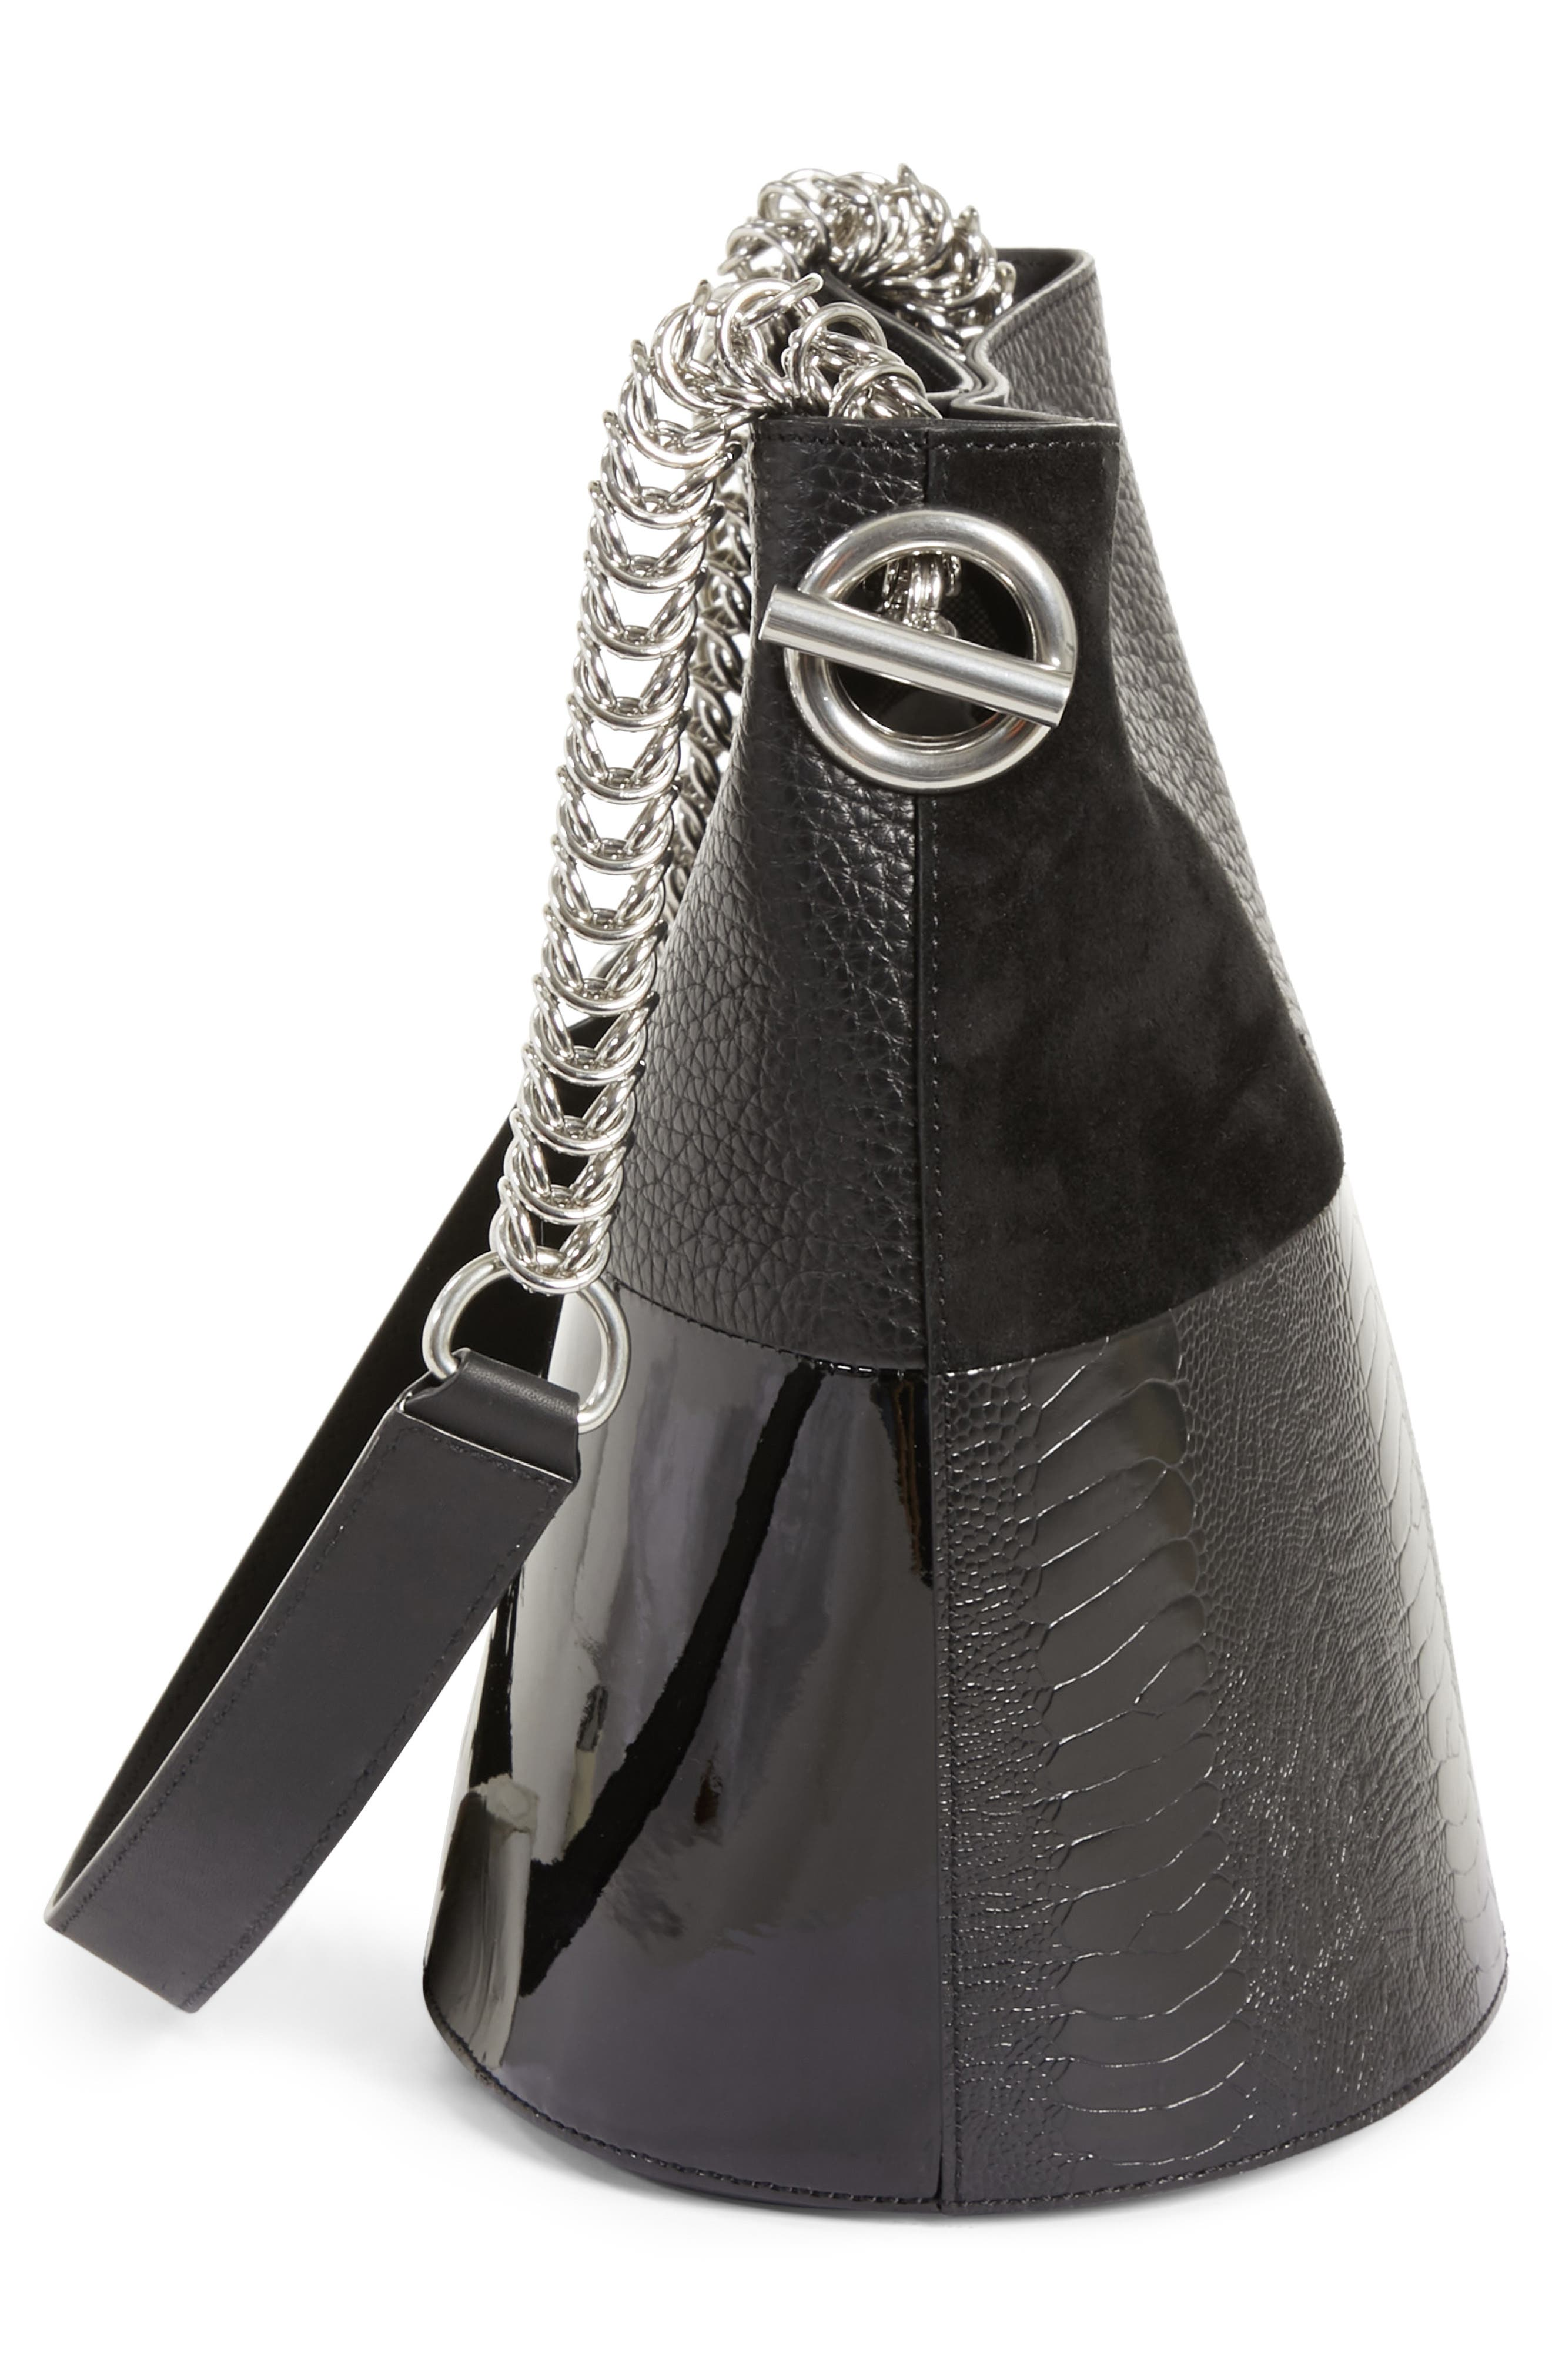 Genesis Patchwork Leather Bucket Bag,                             Alternate thumbnail 5, color,                             BLACK